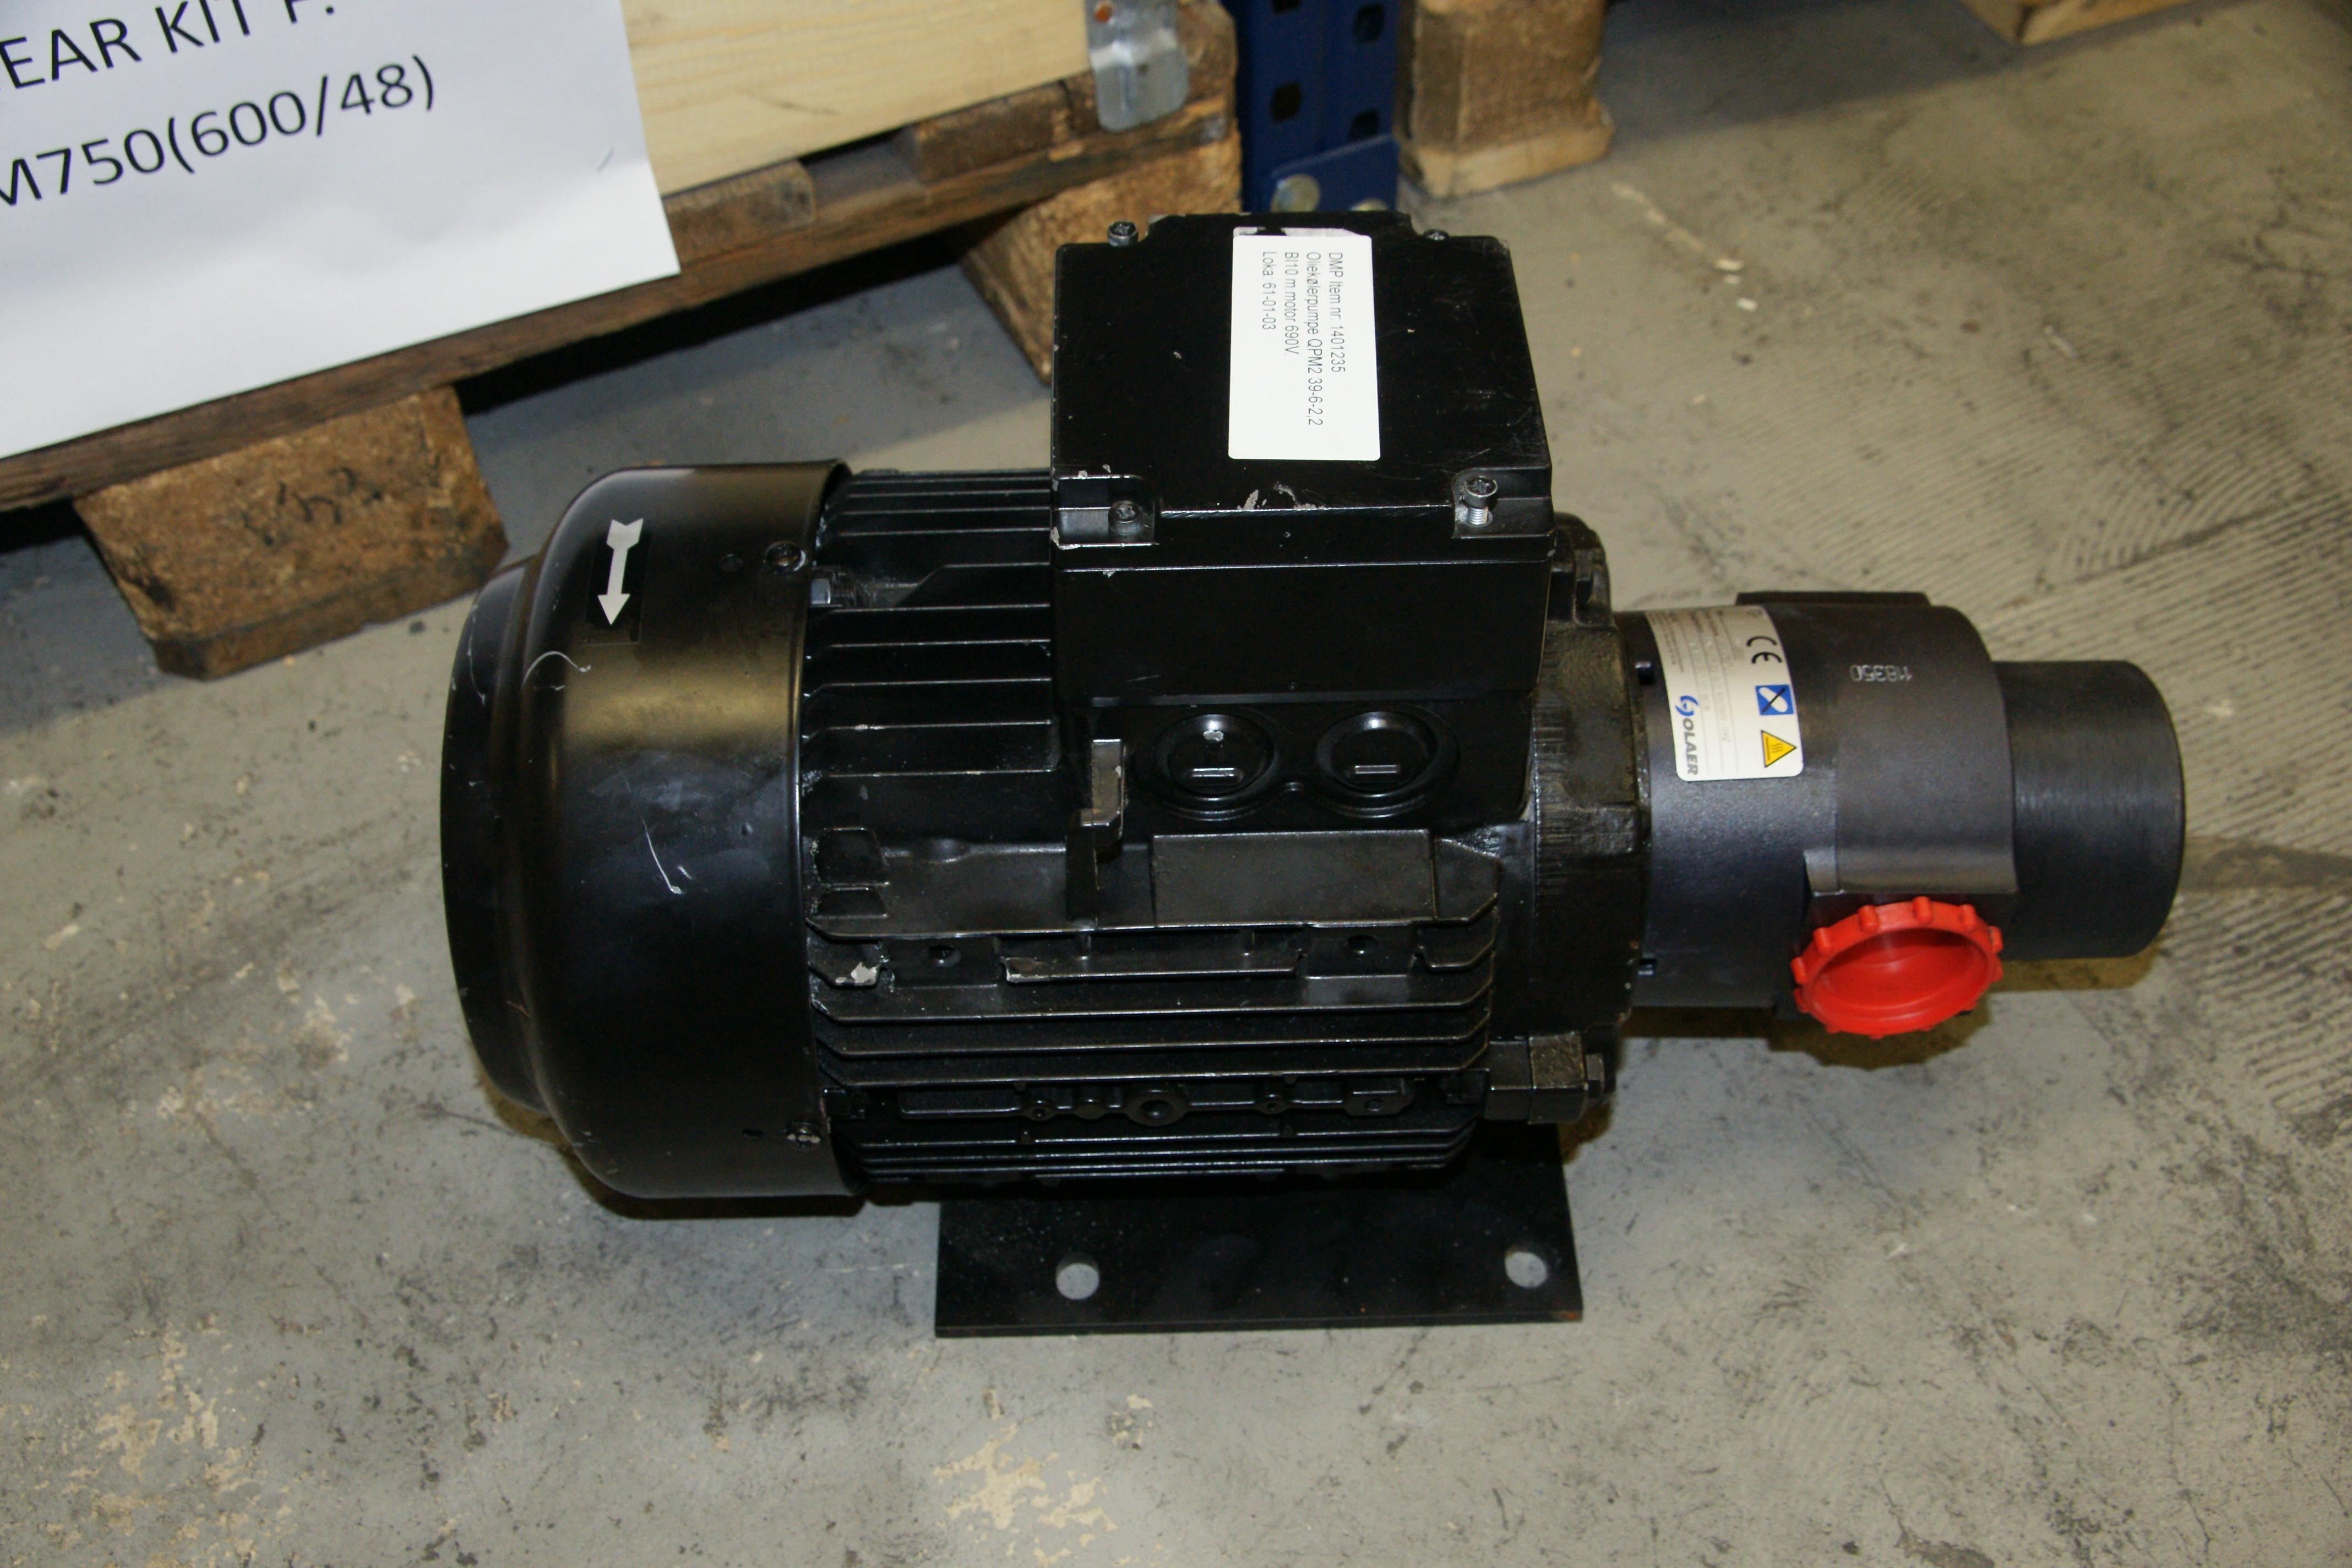 Oil Pump Qpm2 39 6 2 2 Bi10 W Motor 690v Spares In Motion